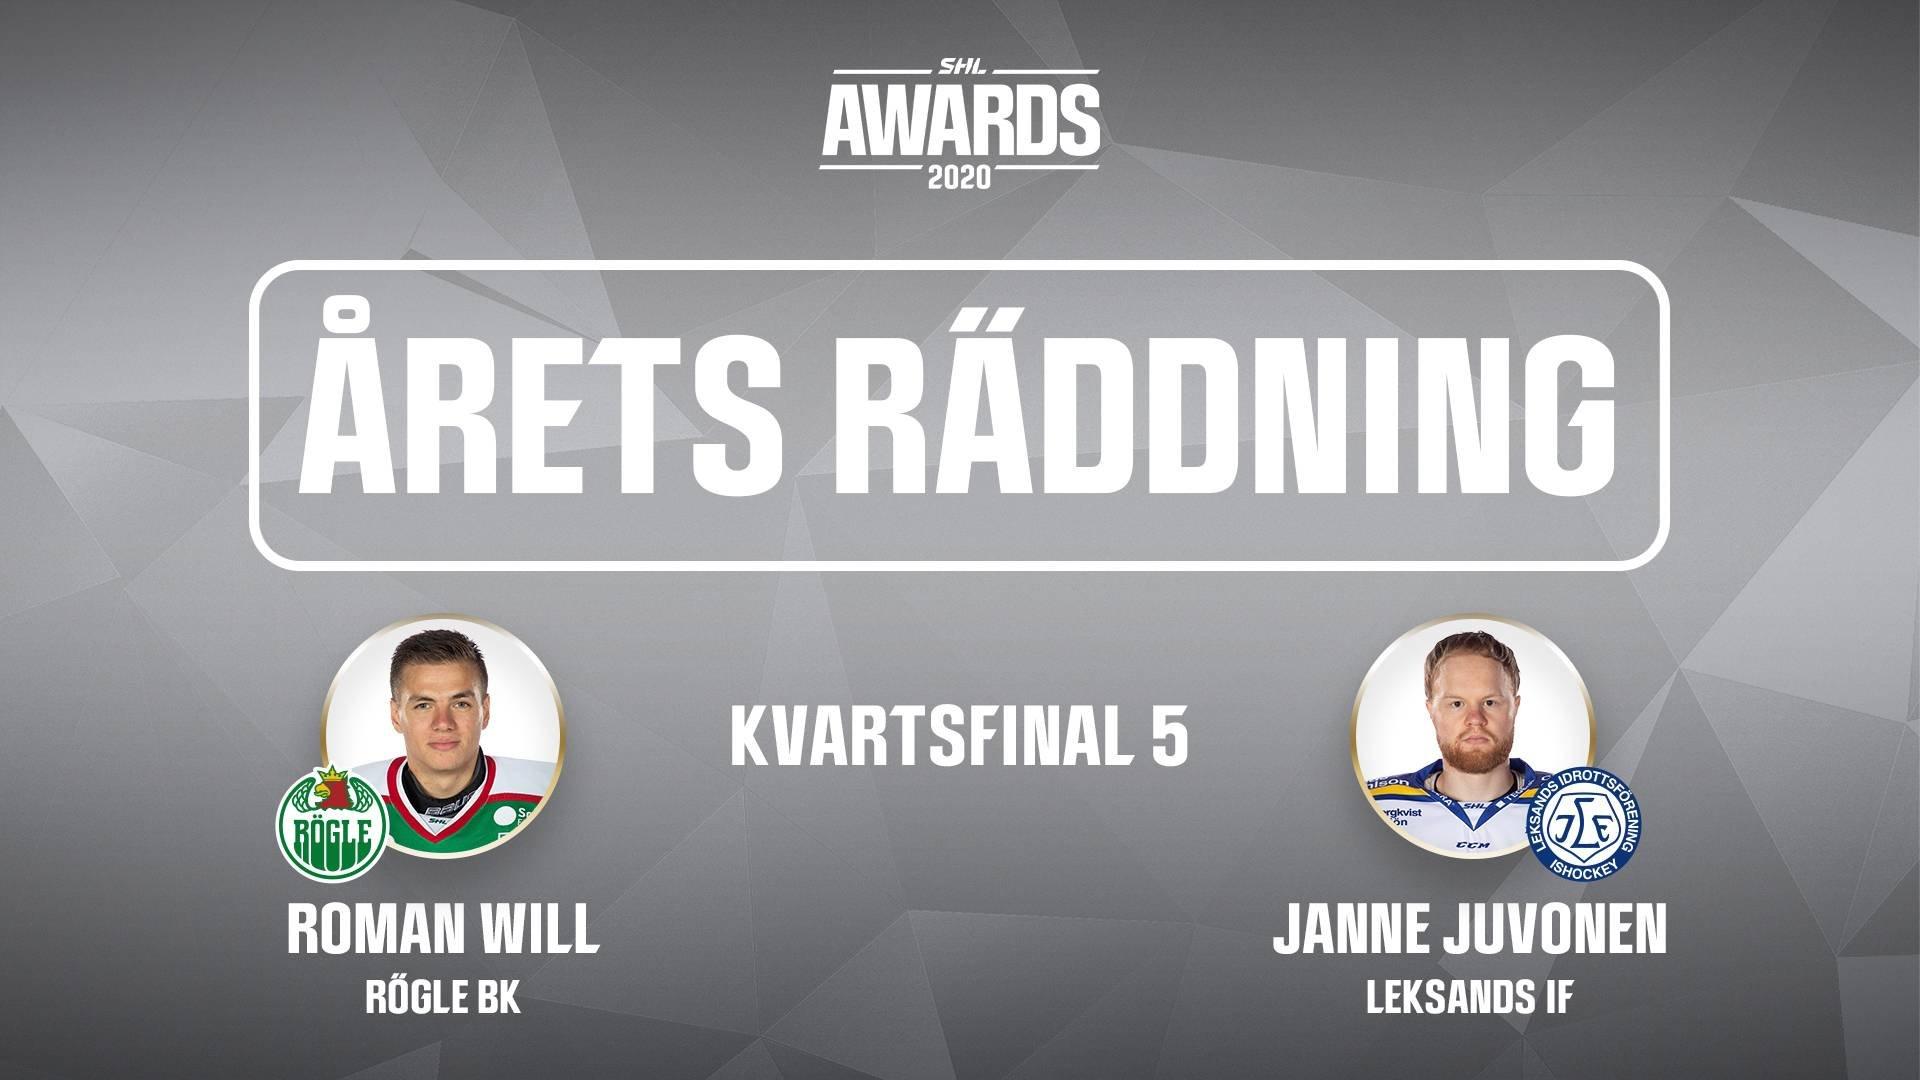 Årets räddning 2019/2020 - Kvartsfinal 5